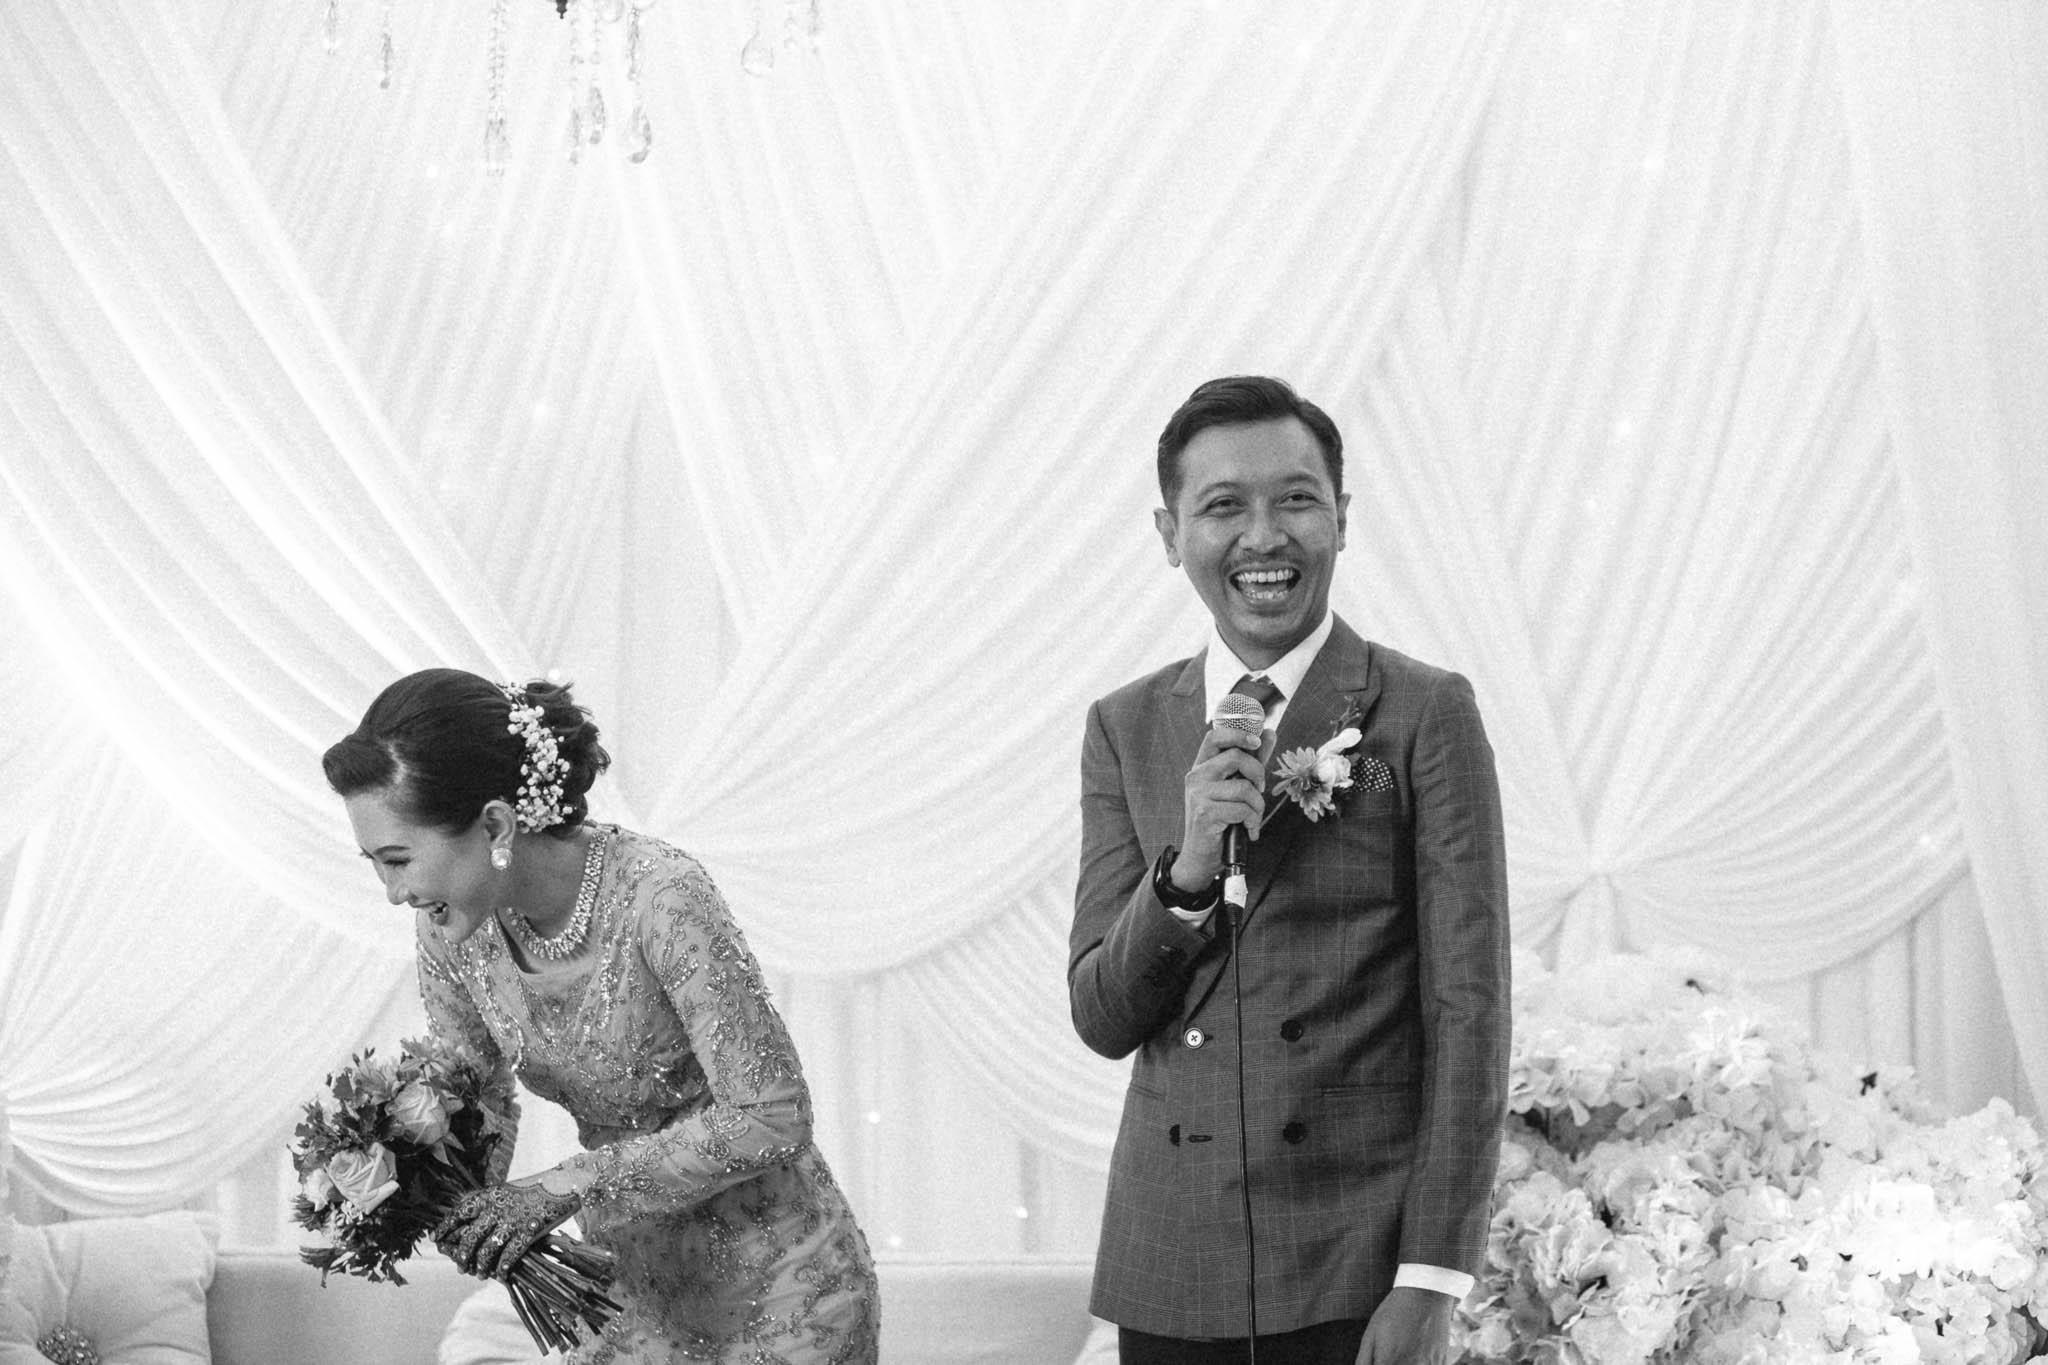 singapore-wedding-photographer-wedding-nufail-addafiq-058.jpg